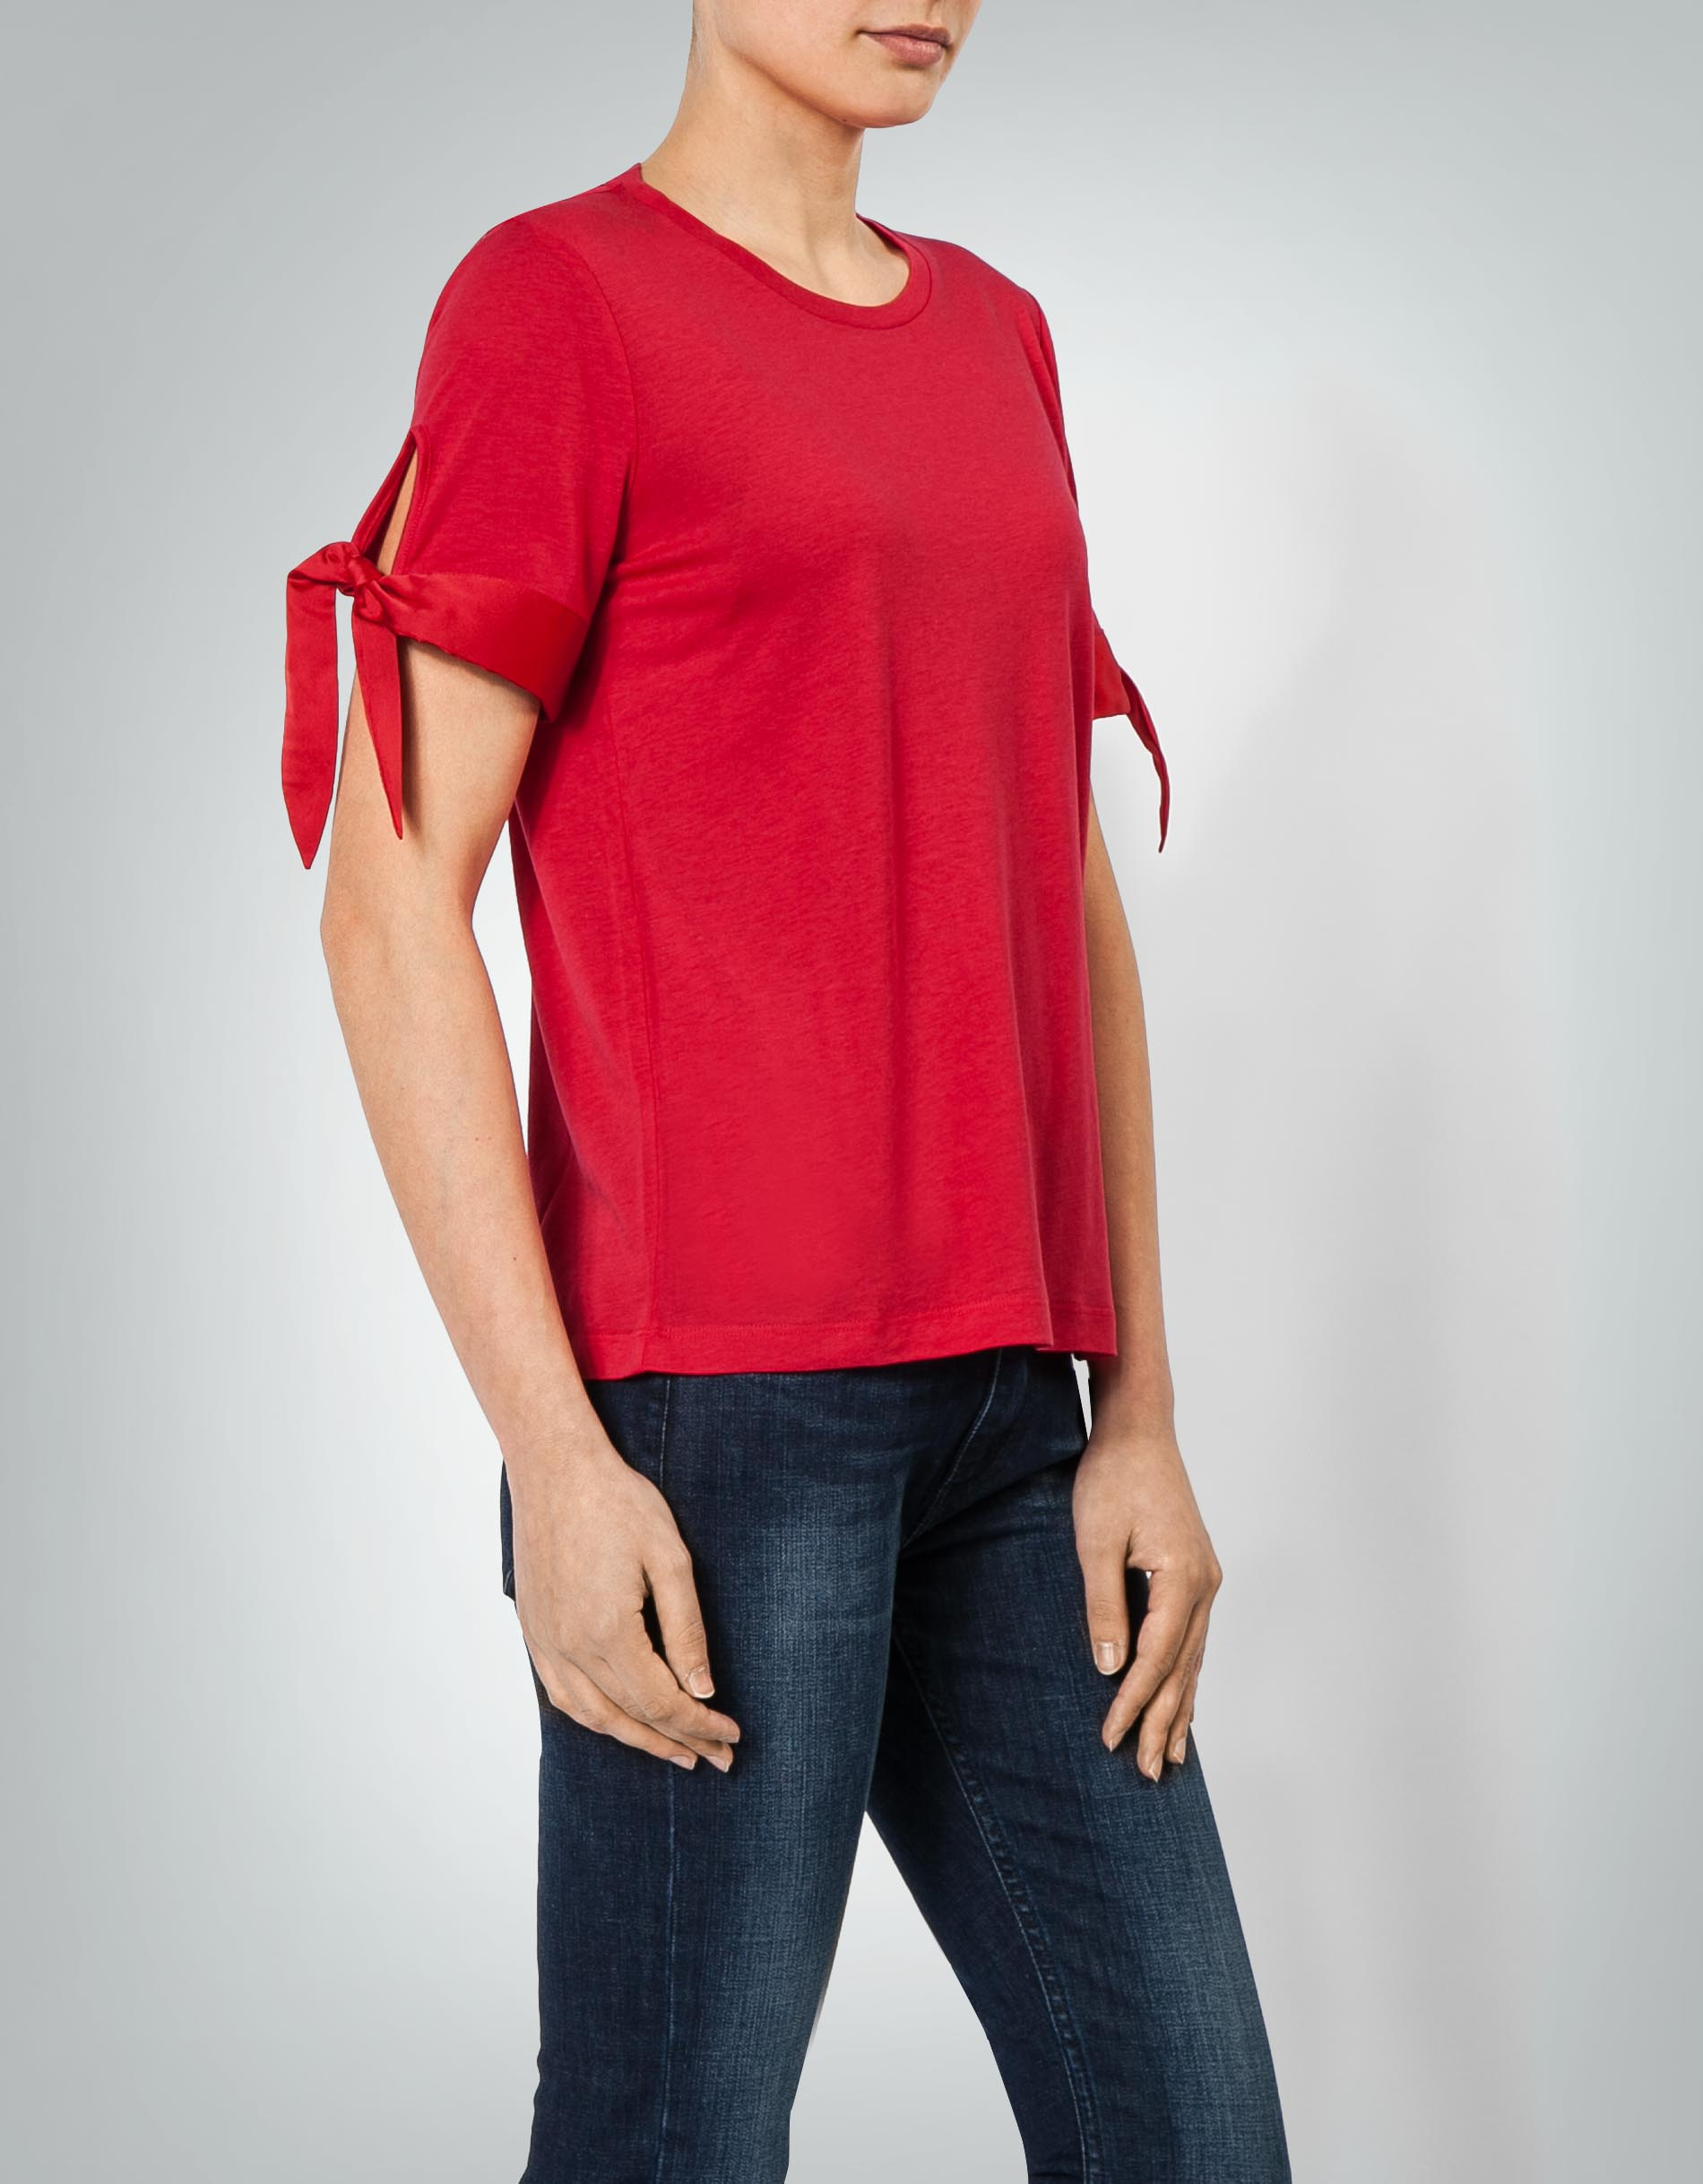 tommy hilfiger damen t shirt shirt mit satinbesatz. Black Bedroom Furniture Sets. Home Design Ideas